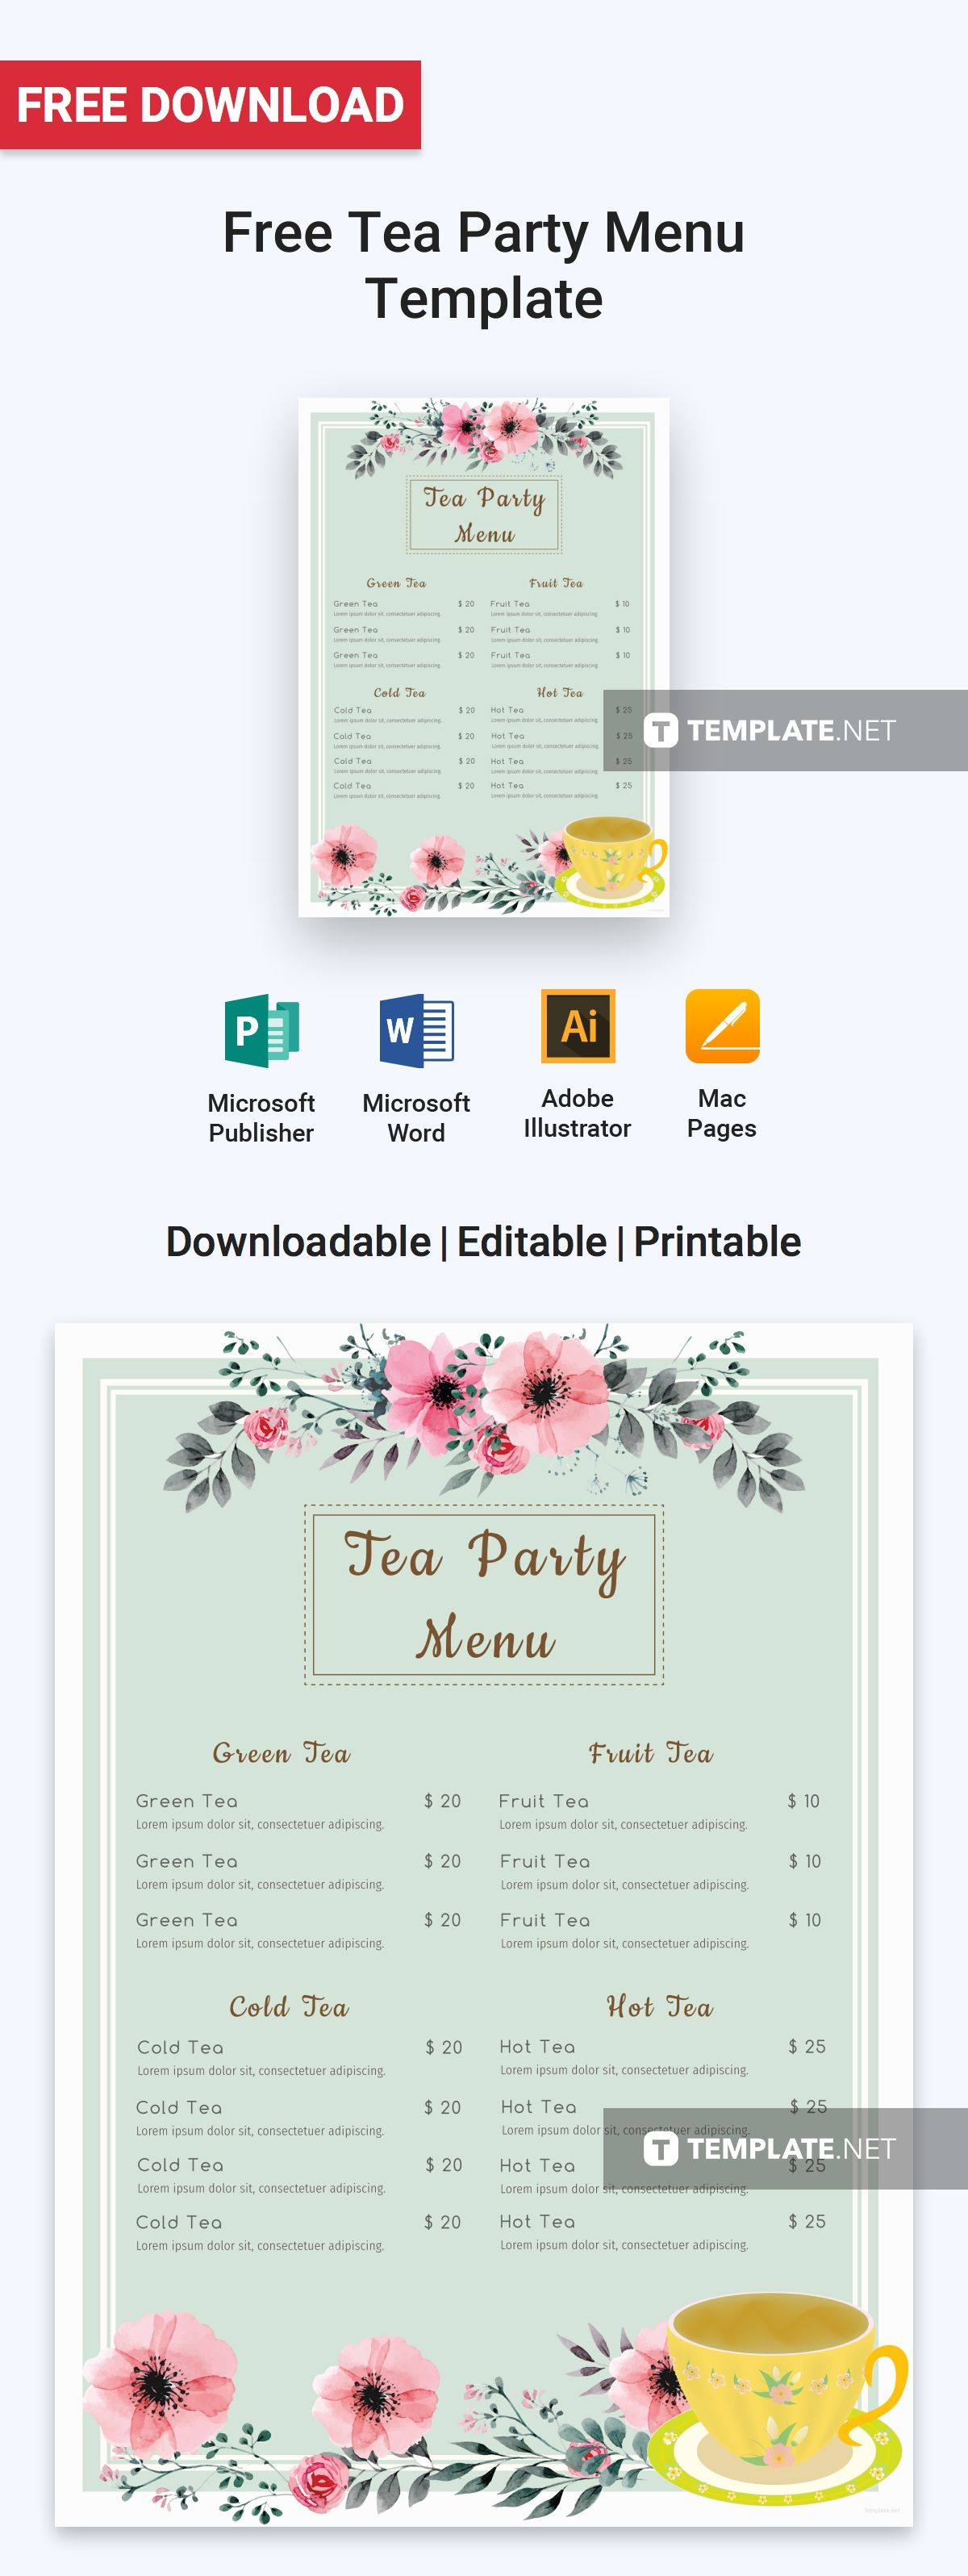 free tea party menu in 2018 tea for 2 pinterest tea party menu